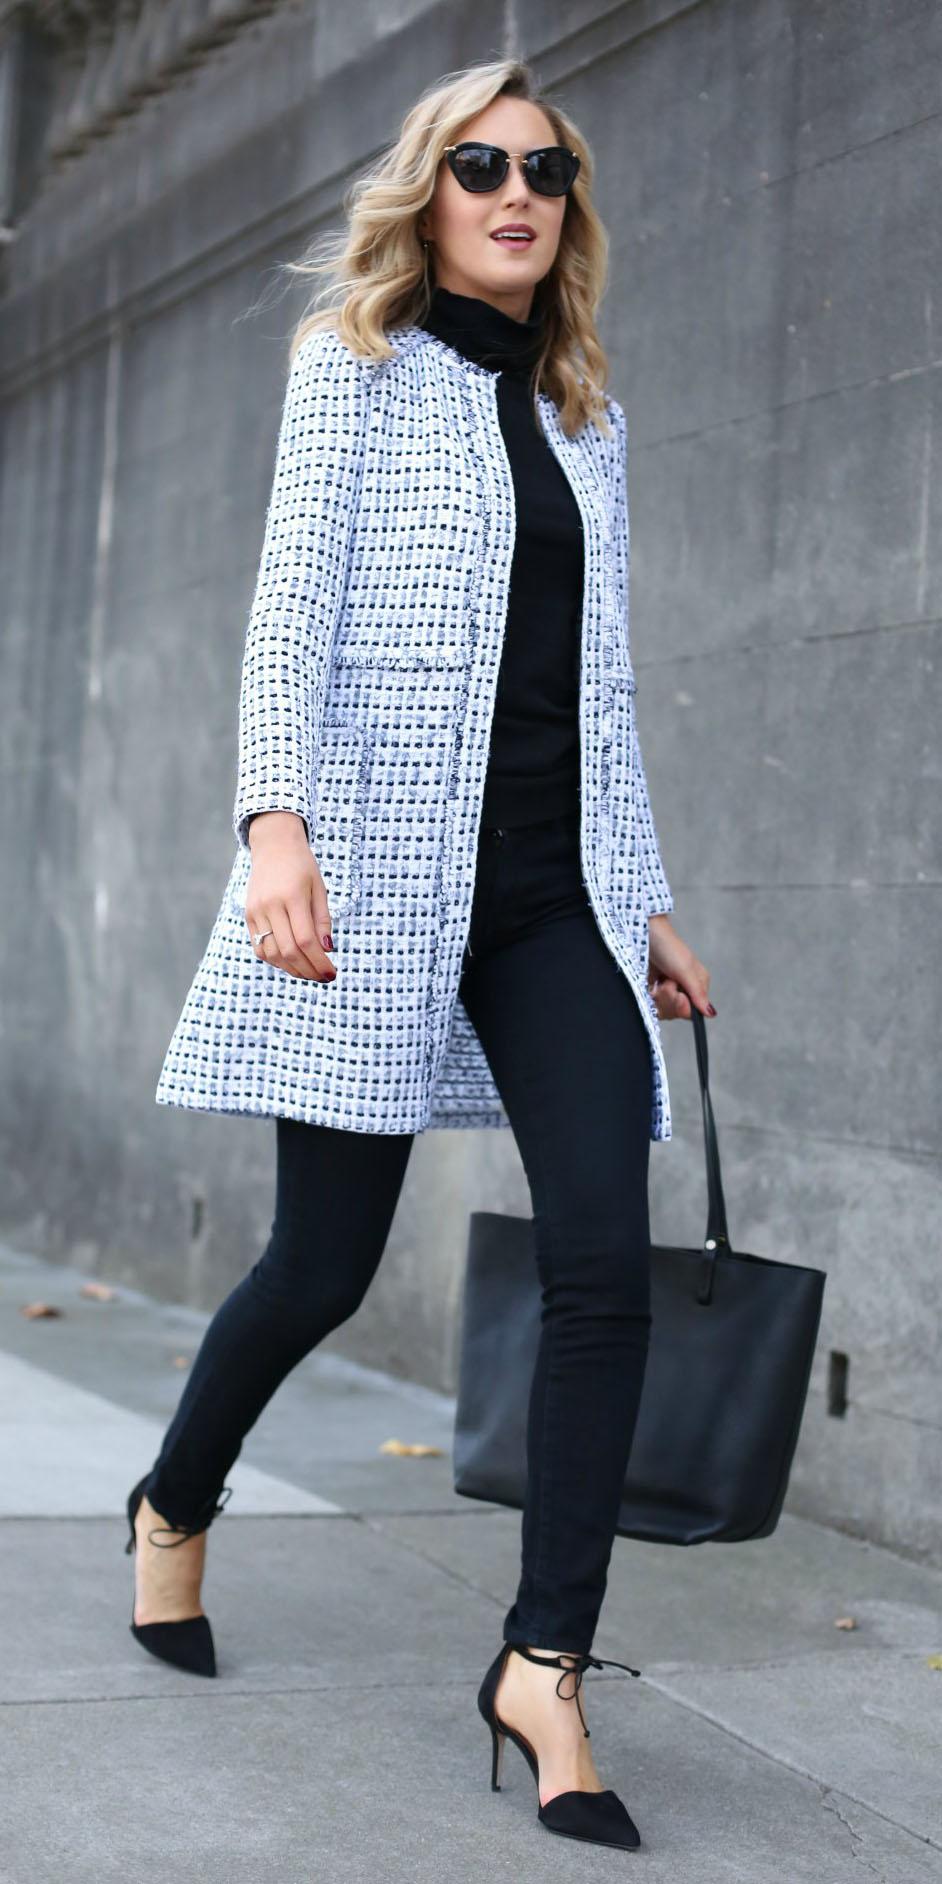 black-skinny-jeans-black-sweater-howtowear-style-fashion-fall-winter-grayl-jacket-coat-black-shoe-pumps-sun-black-bag-tote-turtleneck-blonde-work.jpg